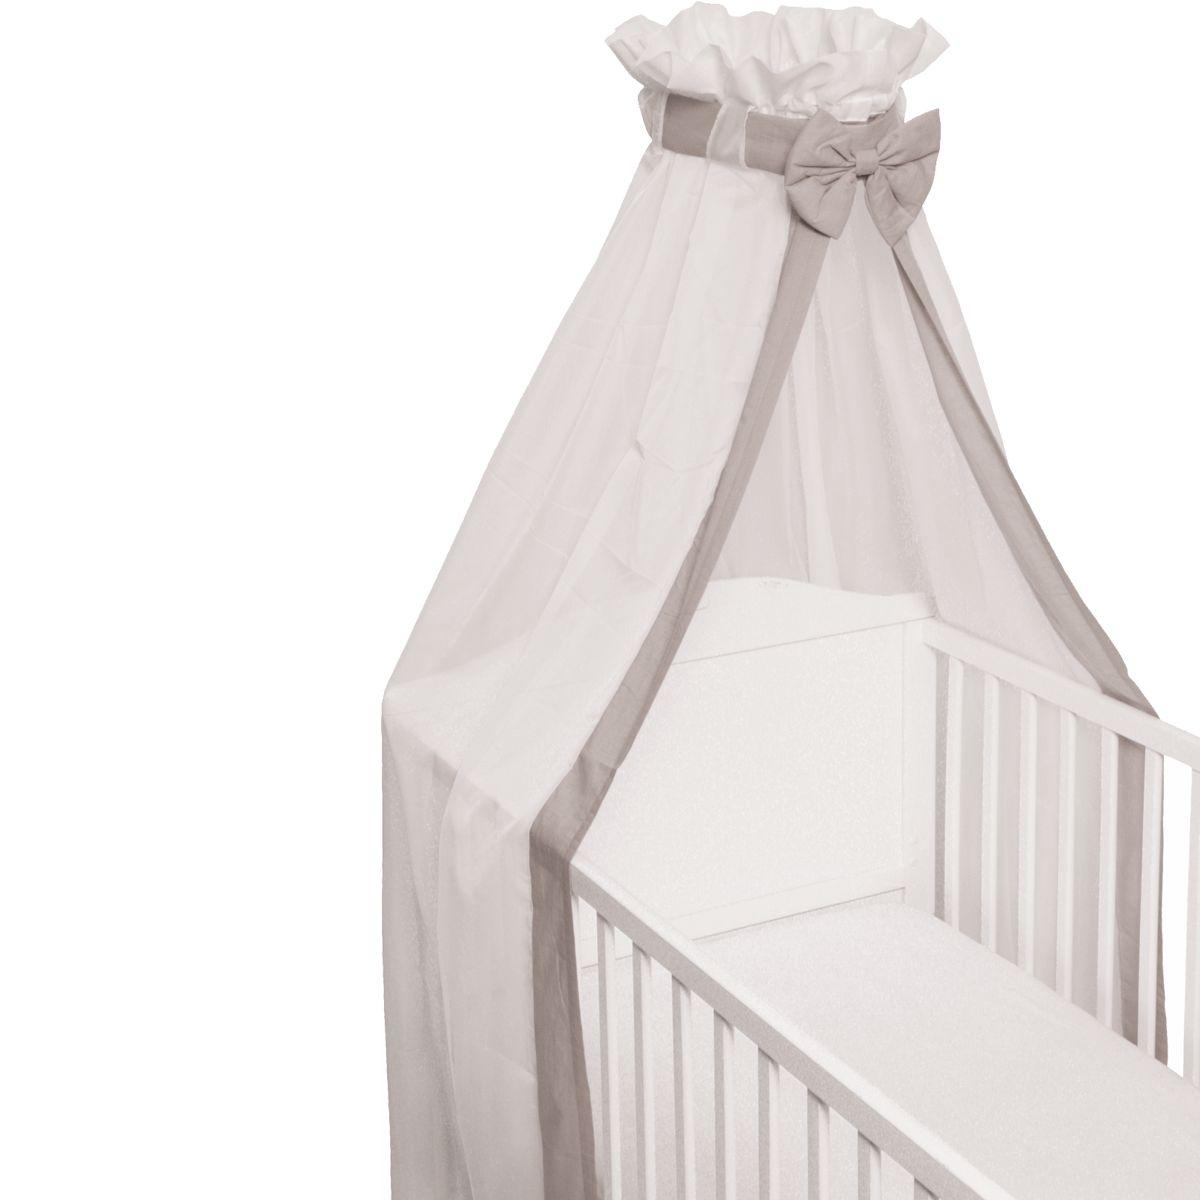 babybett schleier betthimmel moskitonetz baldachin baby. Black Bedroom Furniture Sets. Home Design Ideas